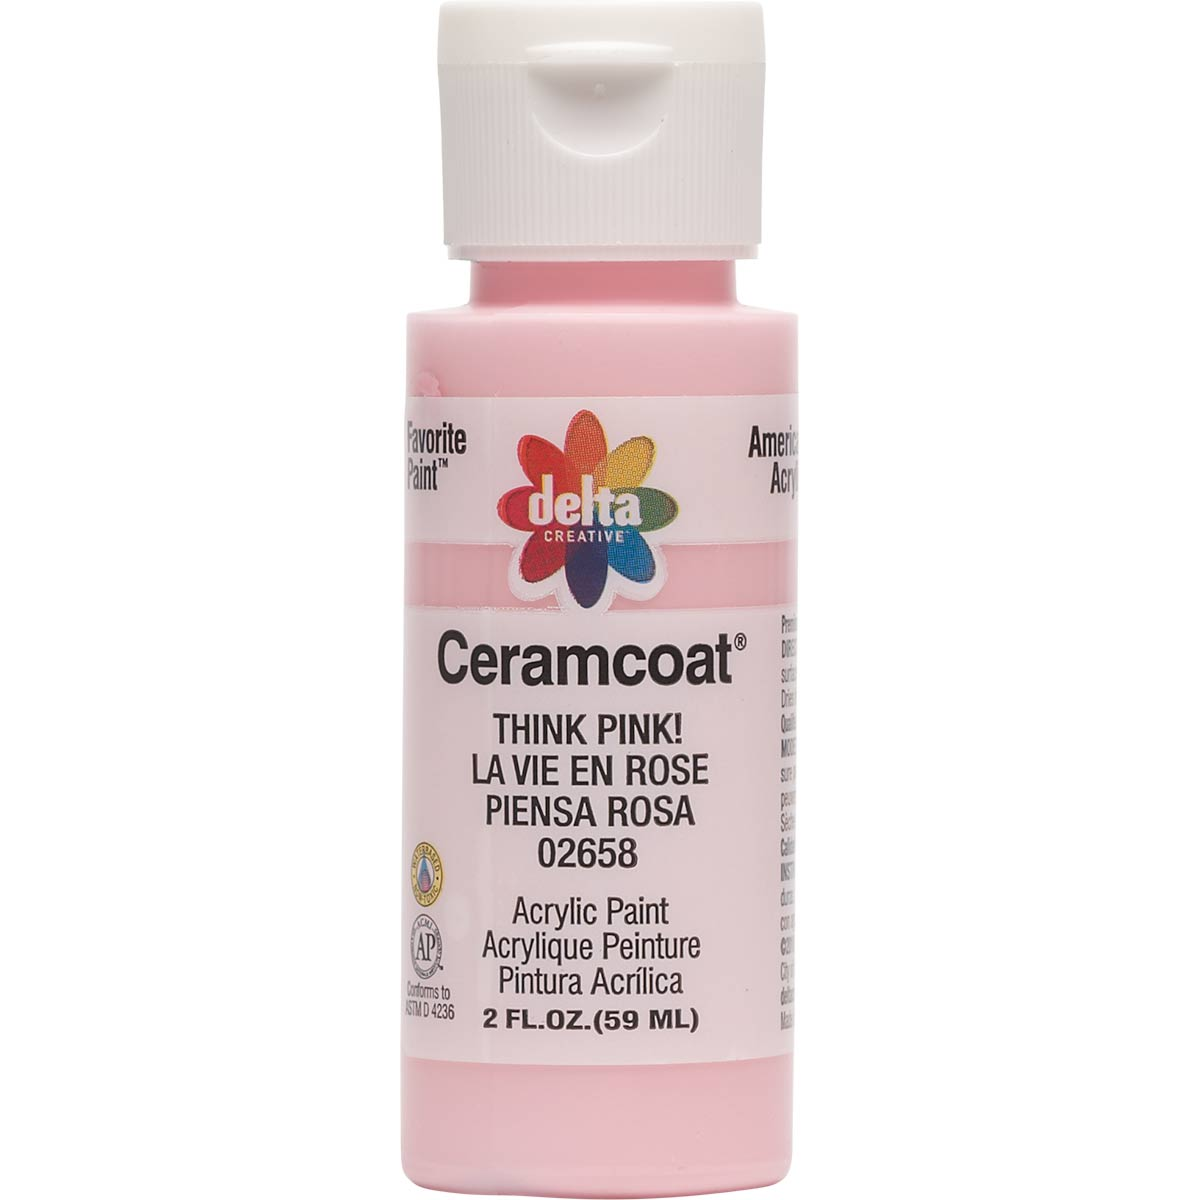 Delta Ceramcoat ® Acrylic Paint - Think Pink!, 2 oz.